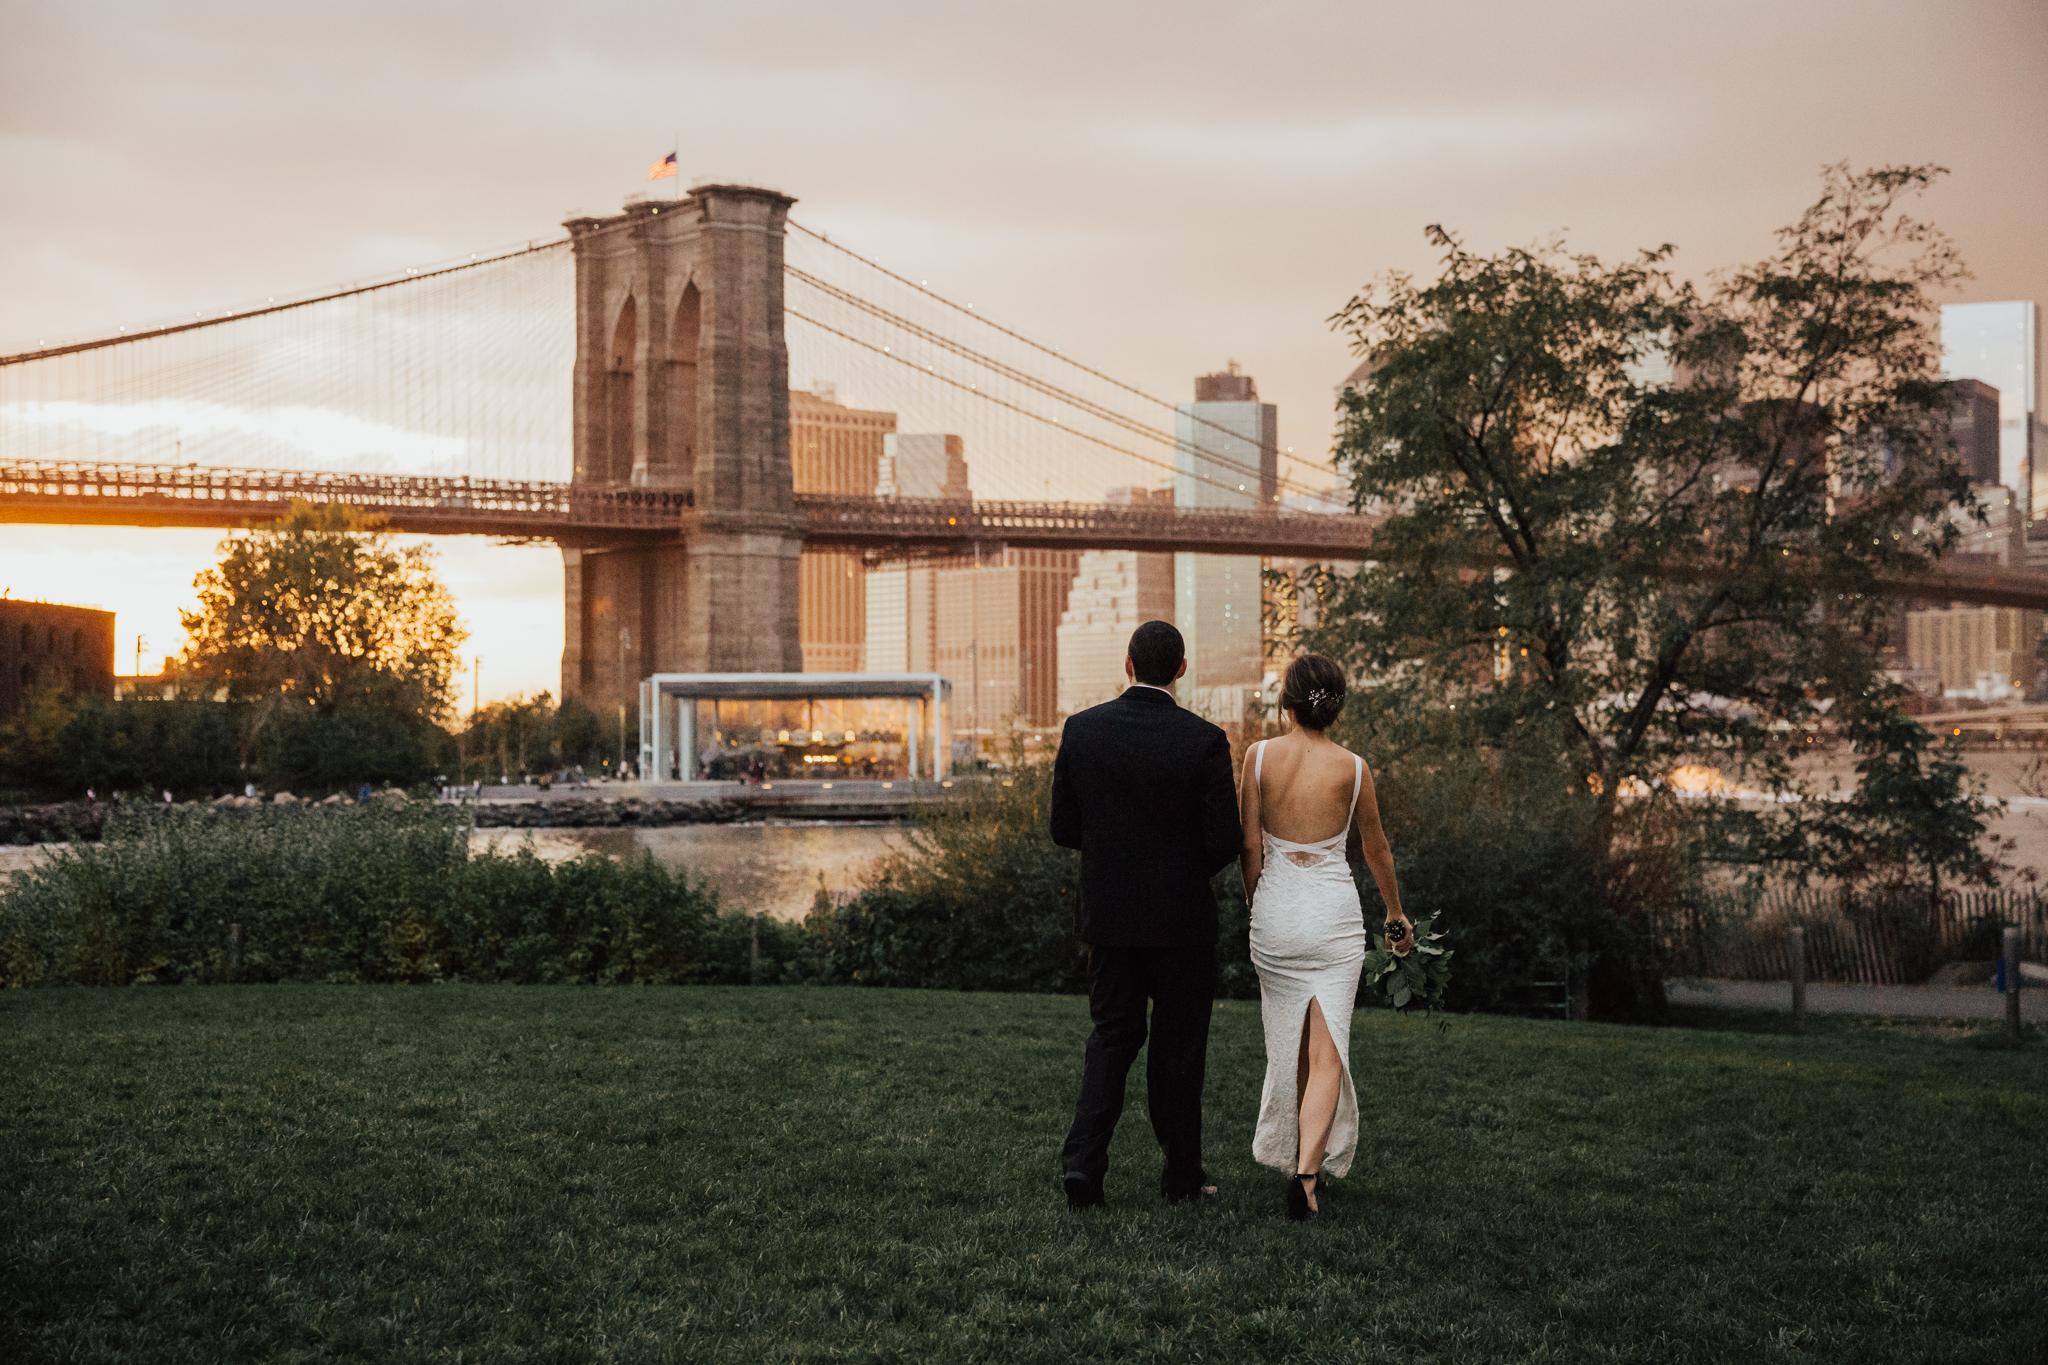 26-bridge-wedding-brooklyn-065.JPG